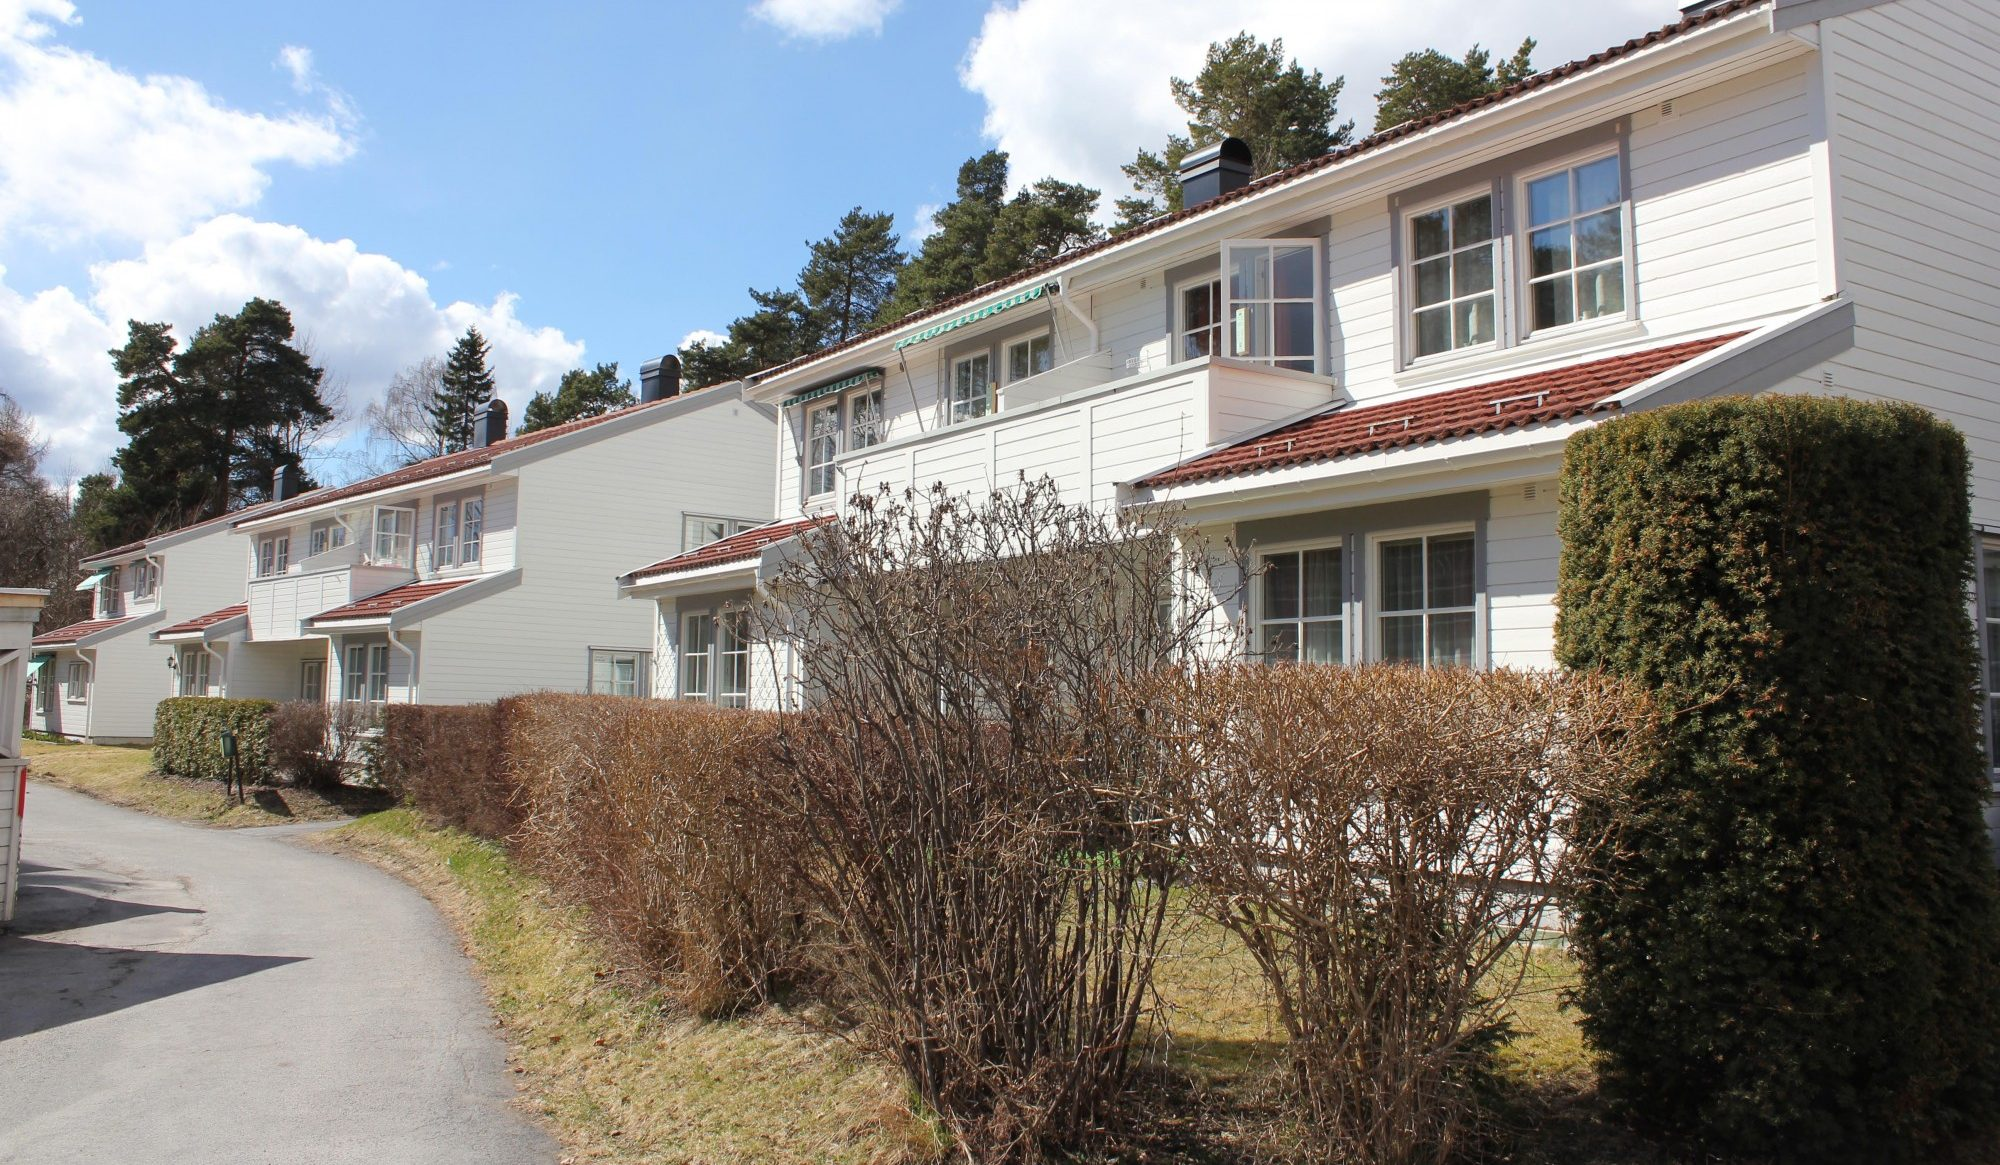 Bygdøy Boligspareklubb for Eldre